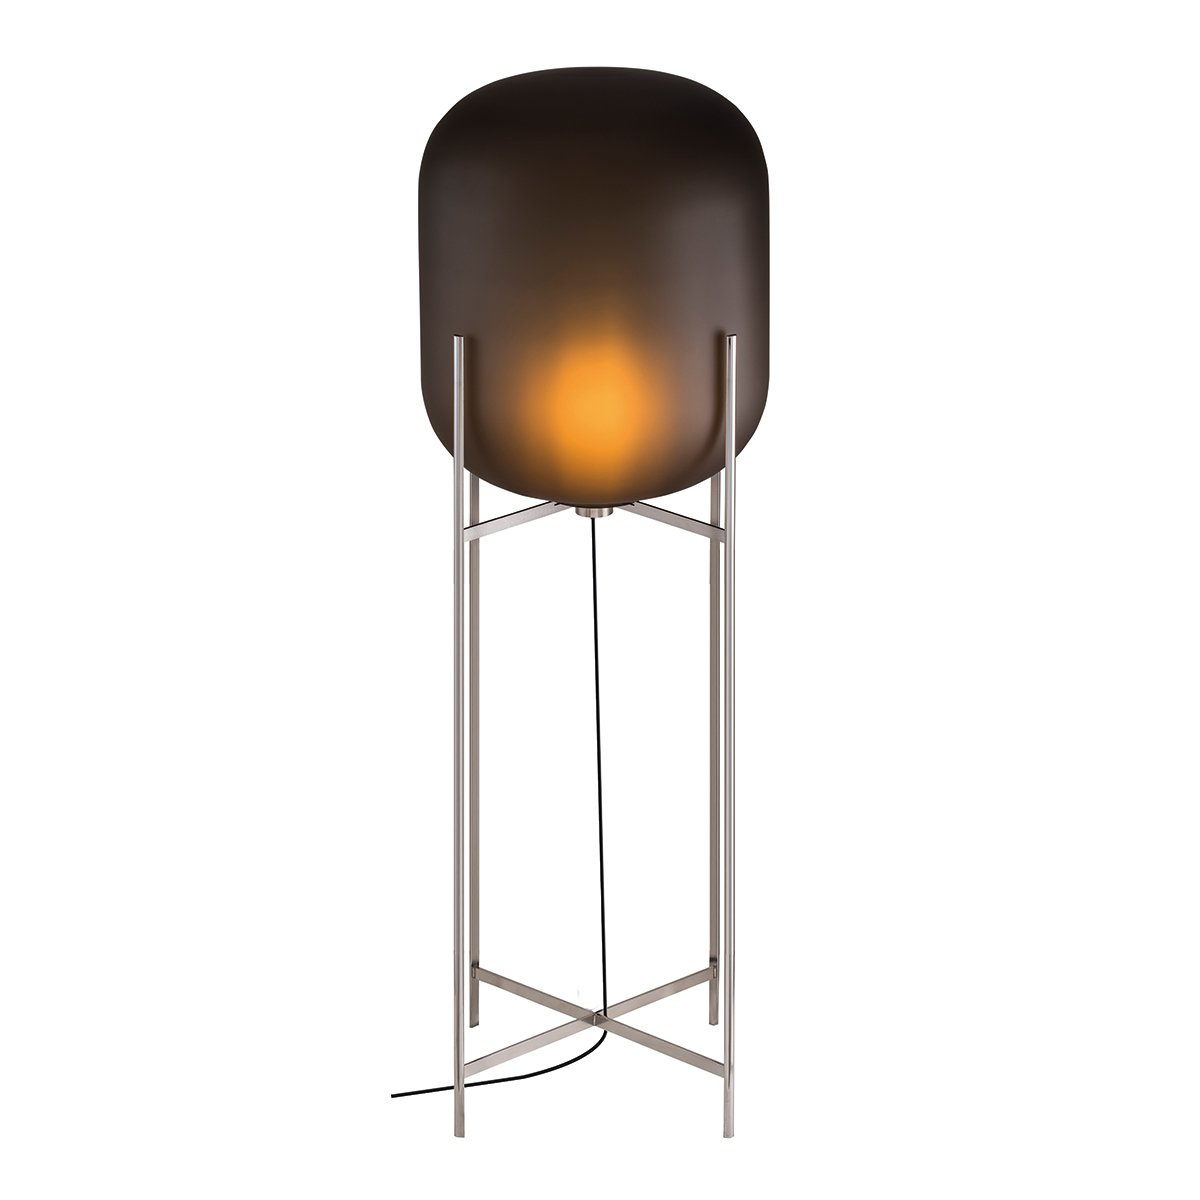 Pulpo Oda Vloerlamp Large (2014) - Mat Smoke Grey / Chroom